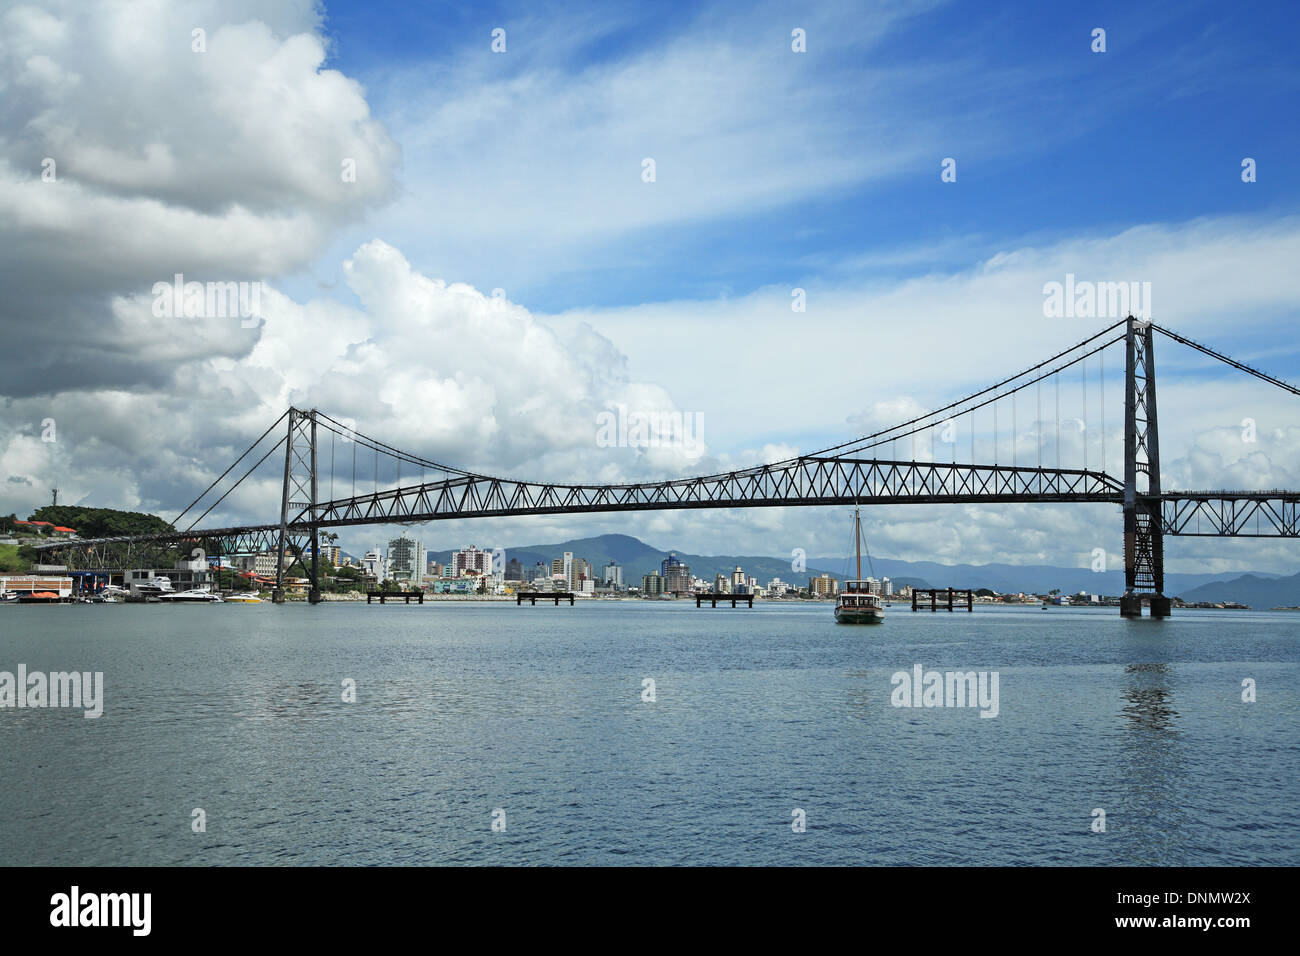 Brazil, Santa catarina, Florianopolis, Hercilio Luz Bridge - Stock Image